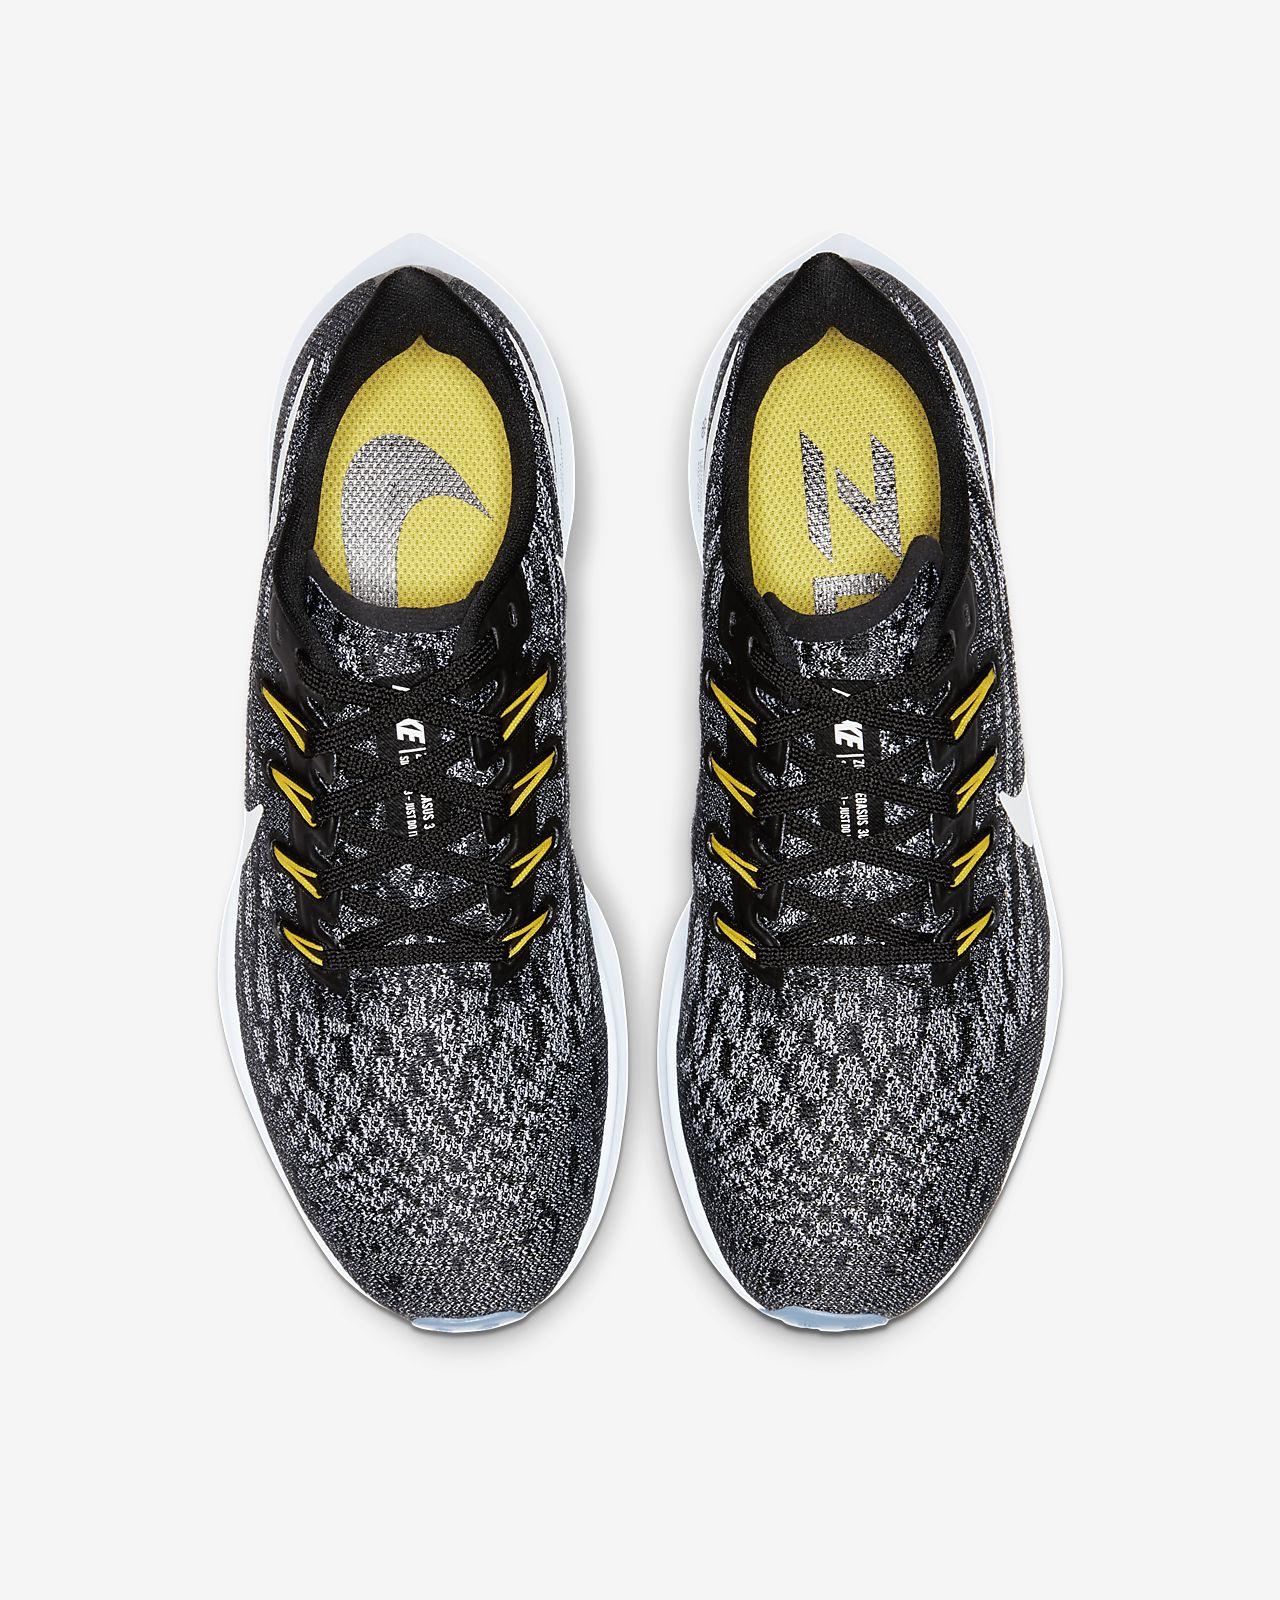 Zapatillas neutras Nike mujer Tennis Warehouse Europe